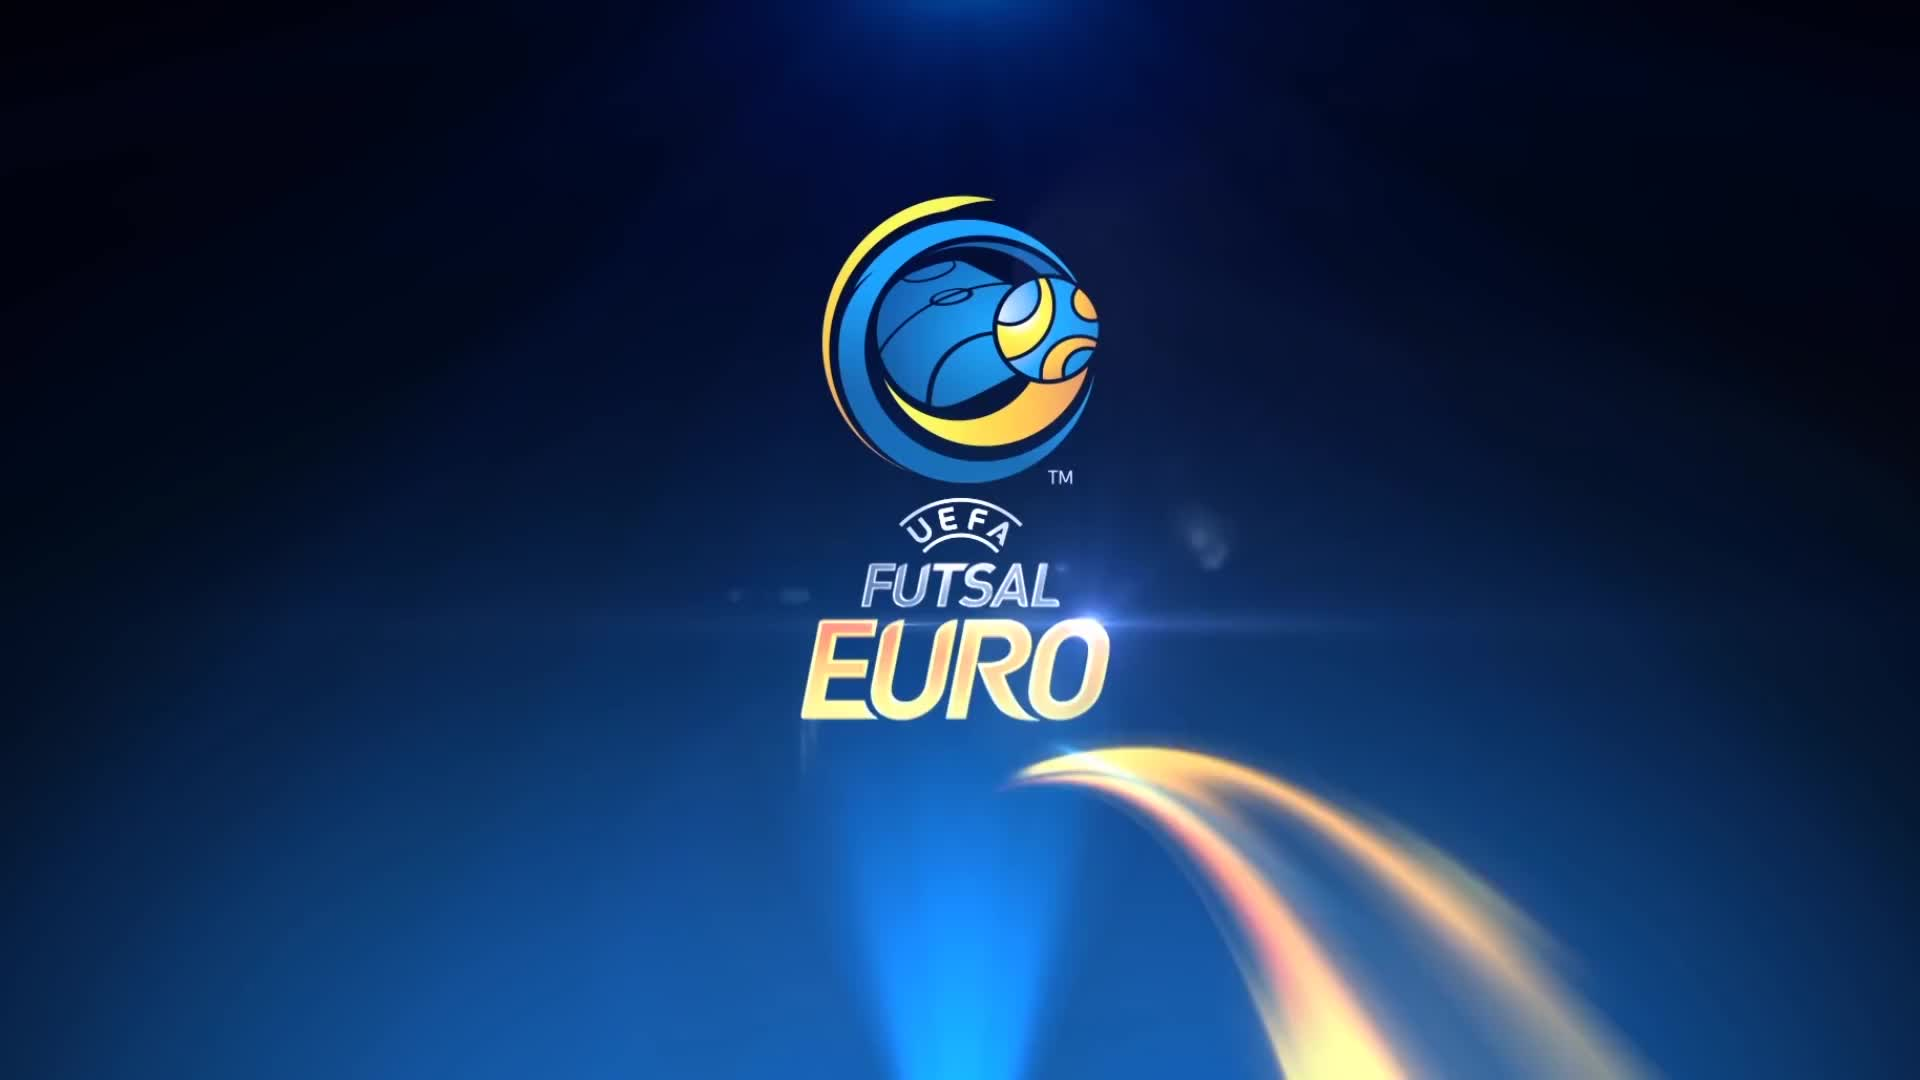 2018, Football, Goal, Goals, Highlights, Match, Portugal, Ricardinho, Romania, Shot, Skill, Slovenia, UEFA, UEFA EURO Futsal, Volley, Win, Highlights: Portugal v Romania GIFs